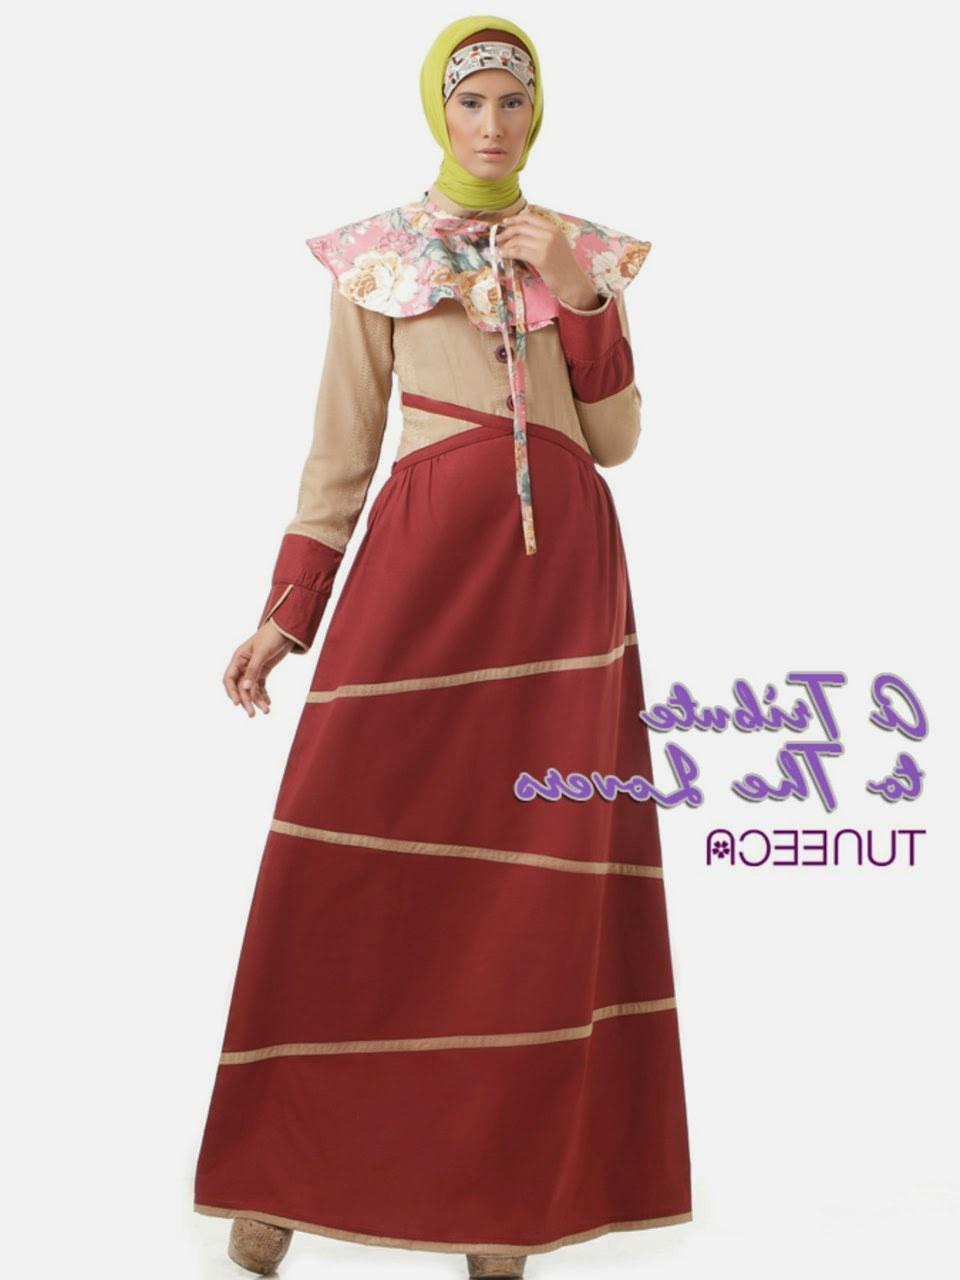 Inspirasi Contoh Baju Lebaran Budm 12 Contoh Model Gamis Muslim Lebaran Terbaru Kumpulan